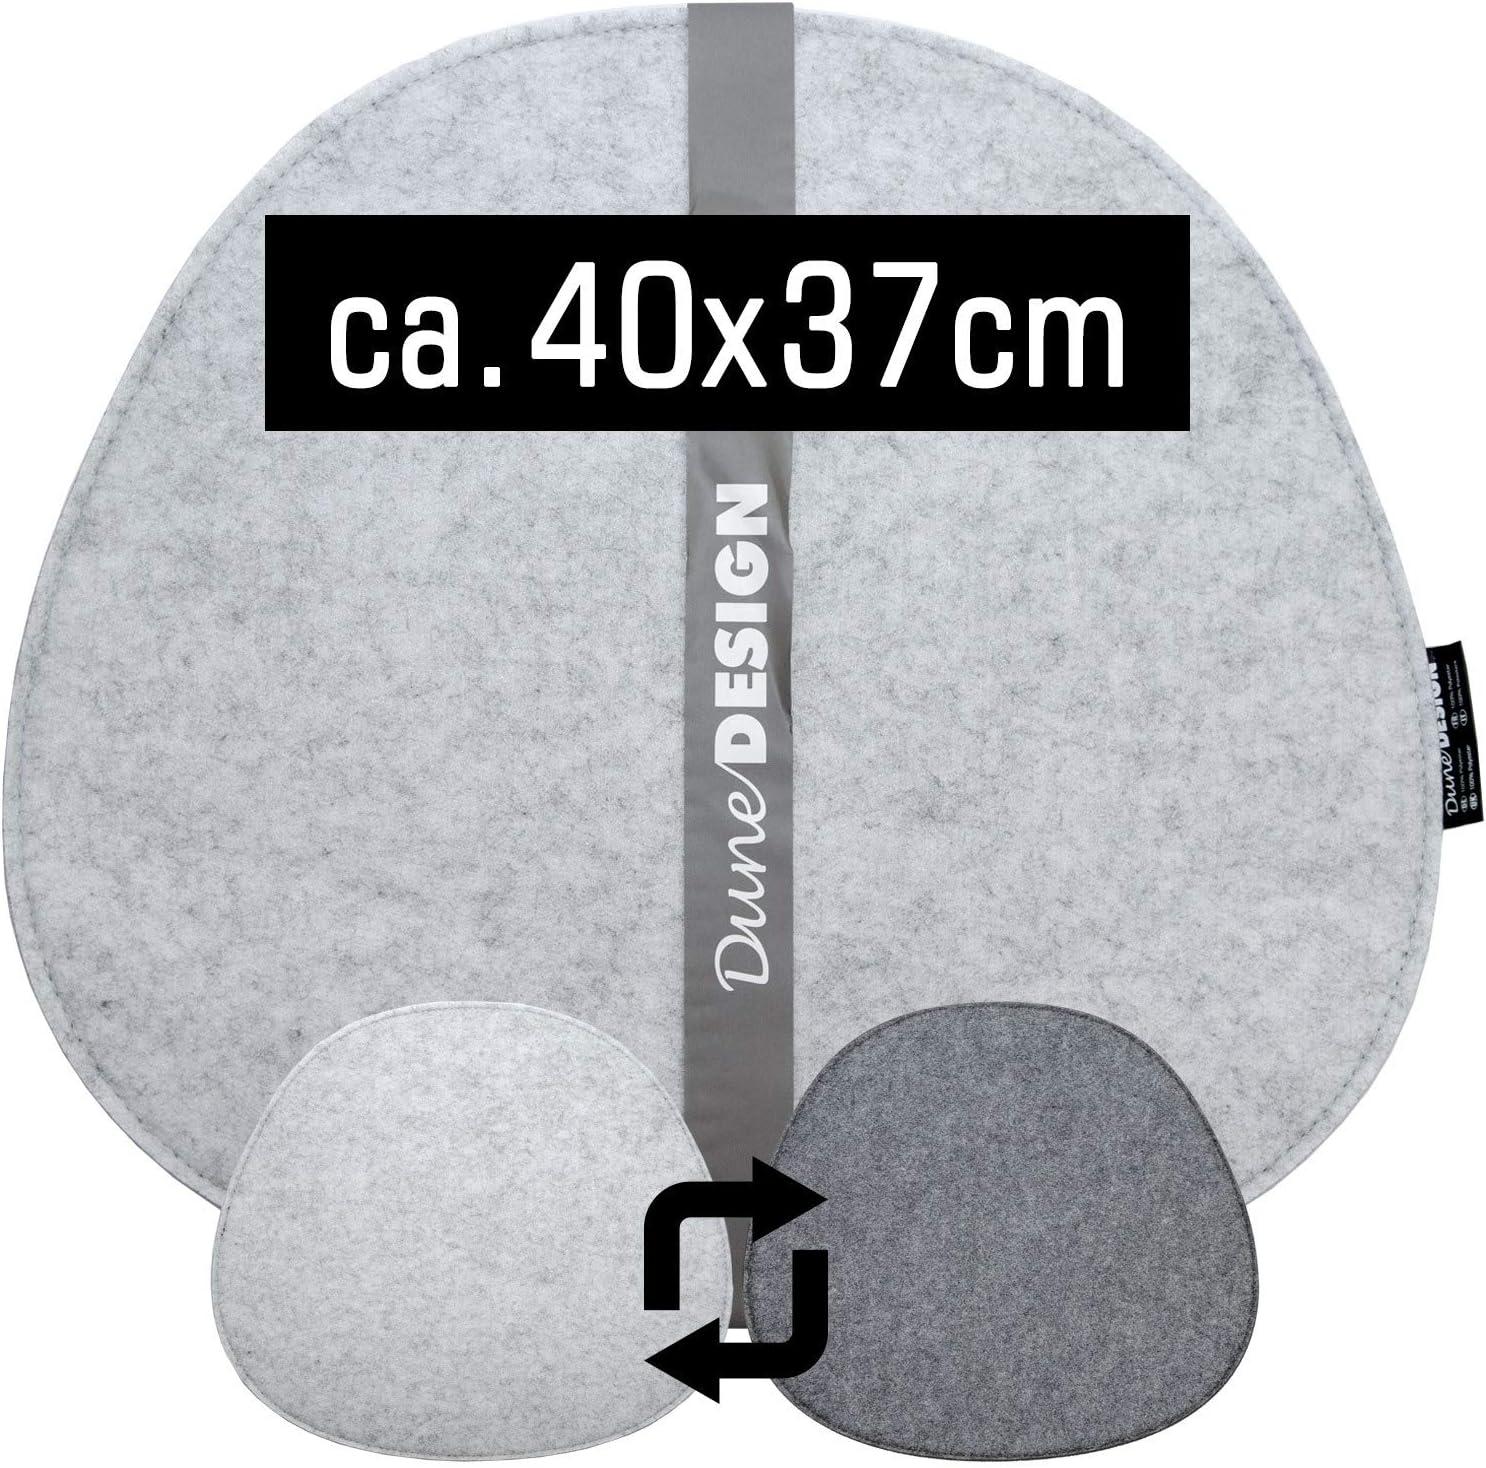 DuneDesign Cuscino Ovale di Feltro per Sedie 40x37cm Sottile 8mm Bicolore Grigio